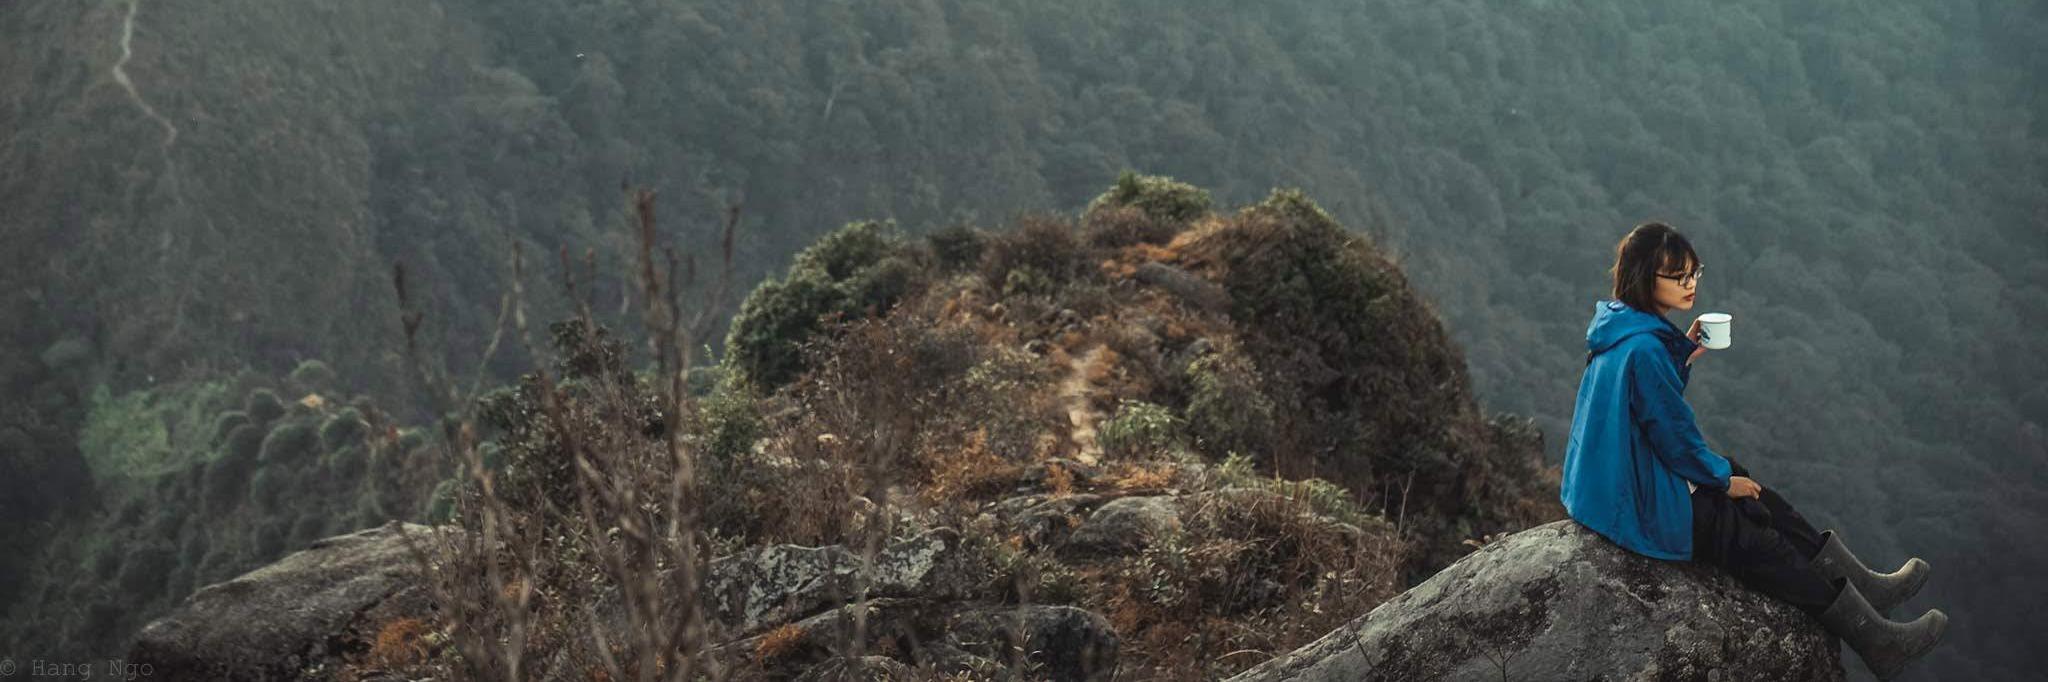 https://gody.vn/blog/ngohang4894244/post/kinh-nghiem-trekking-3-dinh-ta-xua-yen-bai-3-ngay-2-dem-6635